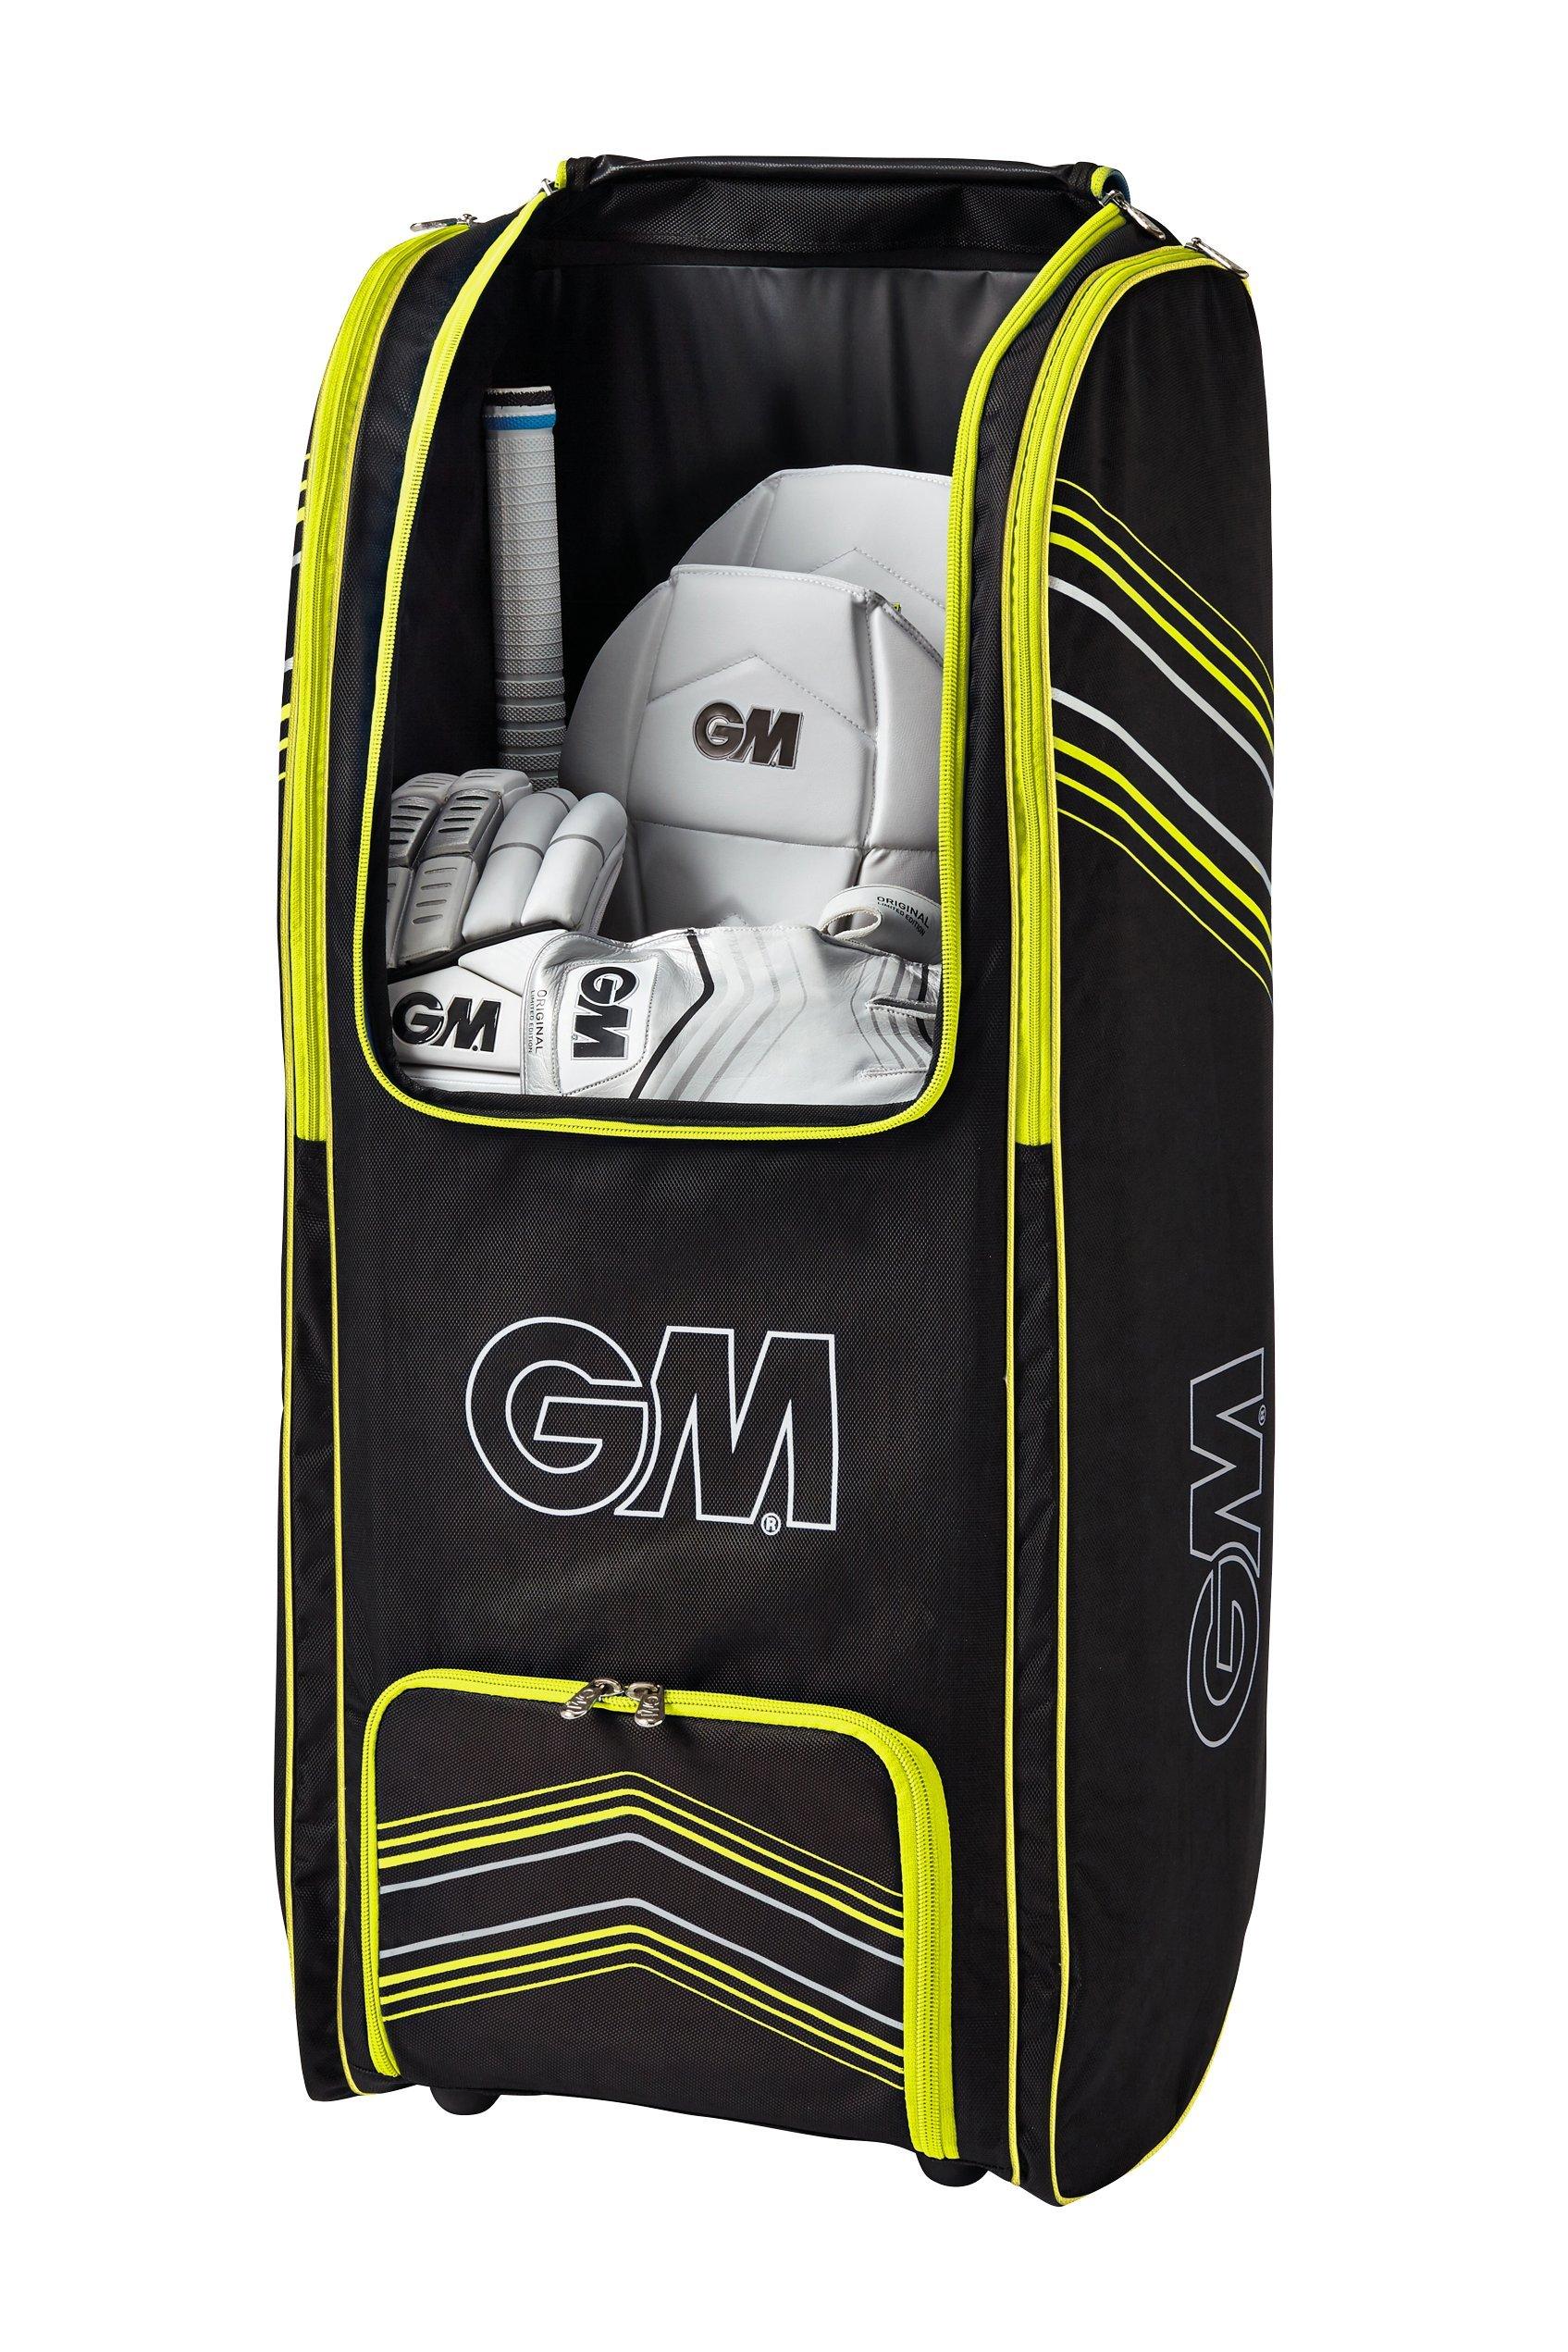 Gunn & Moore Original GM Original Wheelie Duffle Cricket Bag, Black - Yellow